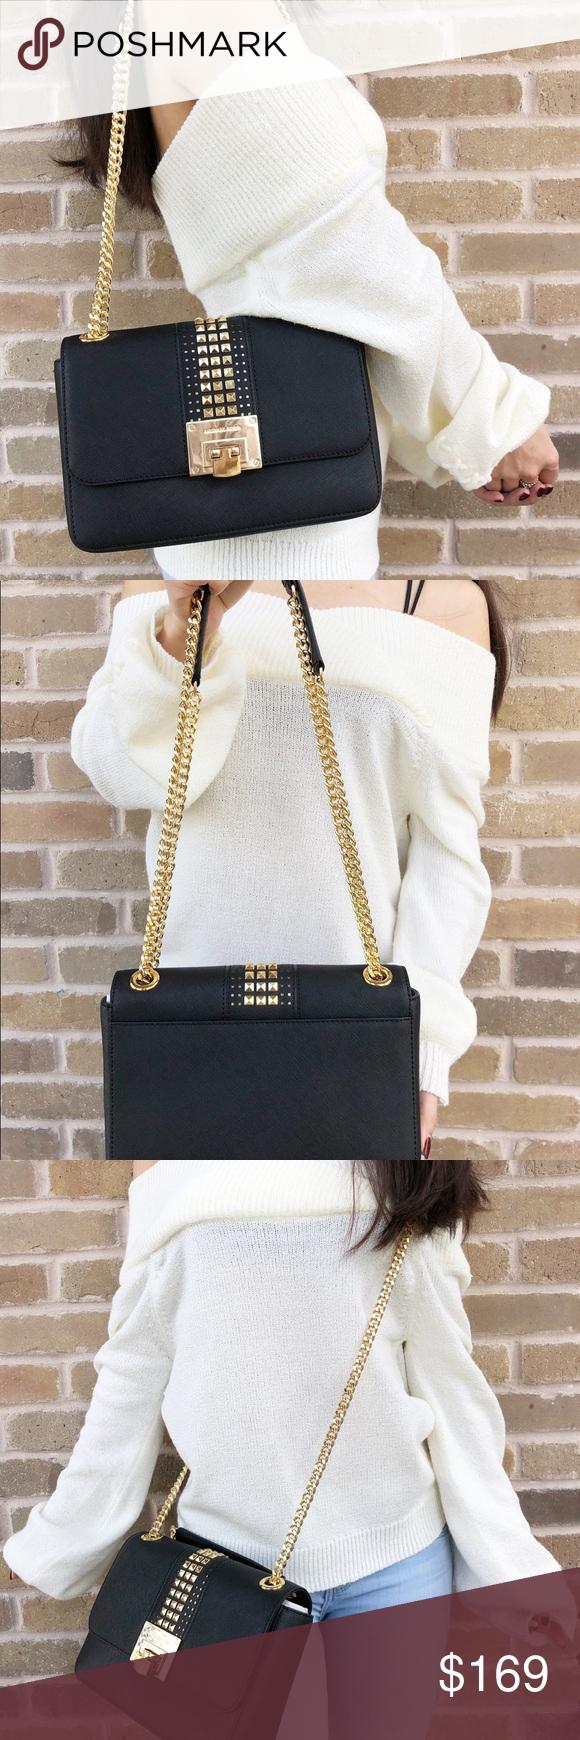 7ee1771dca5577 Michael Kors Tina Stud Medium Black Chain Tote Michael Kors Tina Stud Medium  Should Flap Bag Crossody Black Chain Tote Dual chain/leather handles Studded  ...